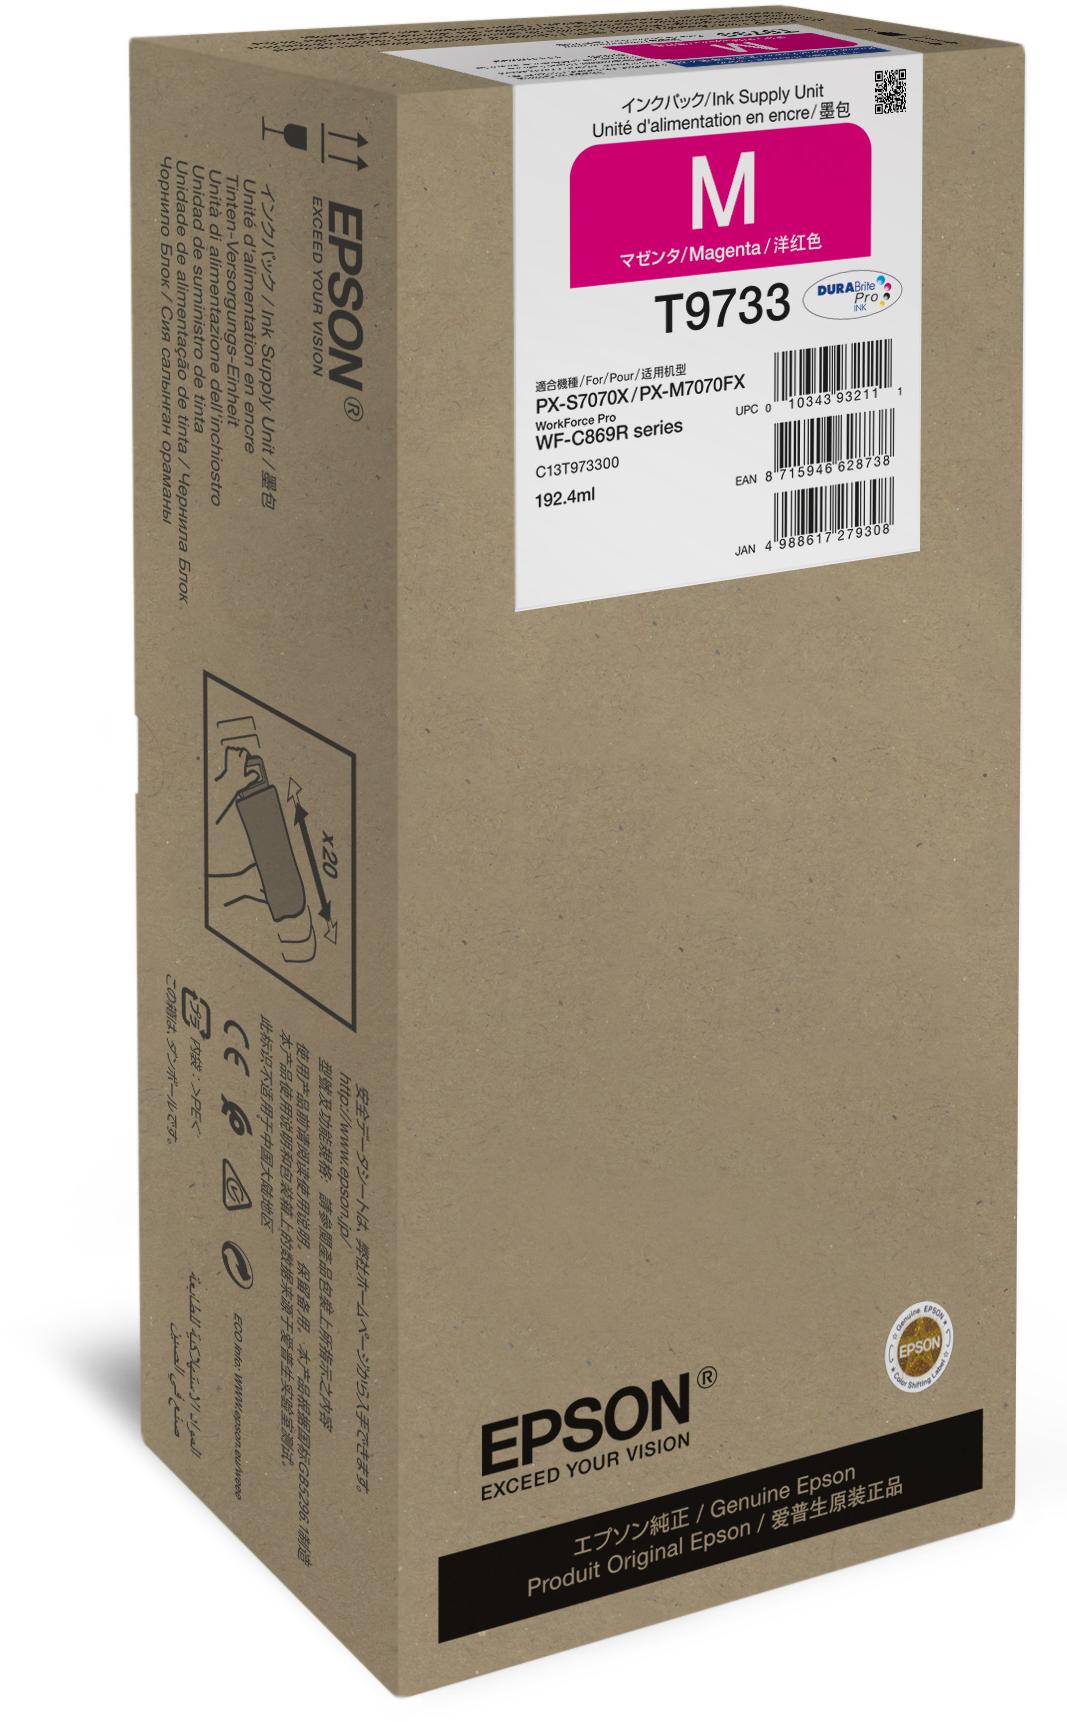 Epson T9733 magenta